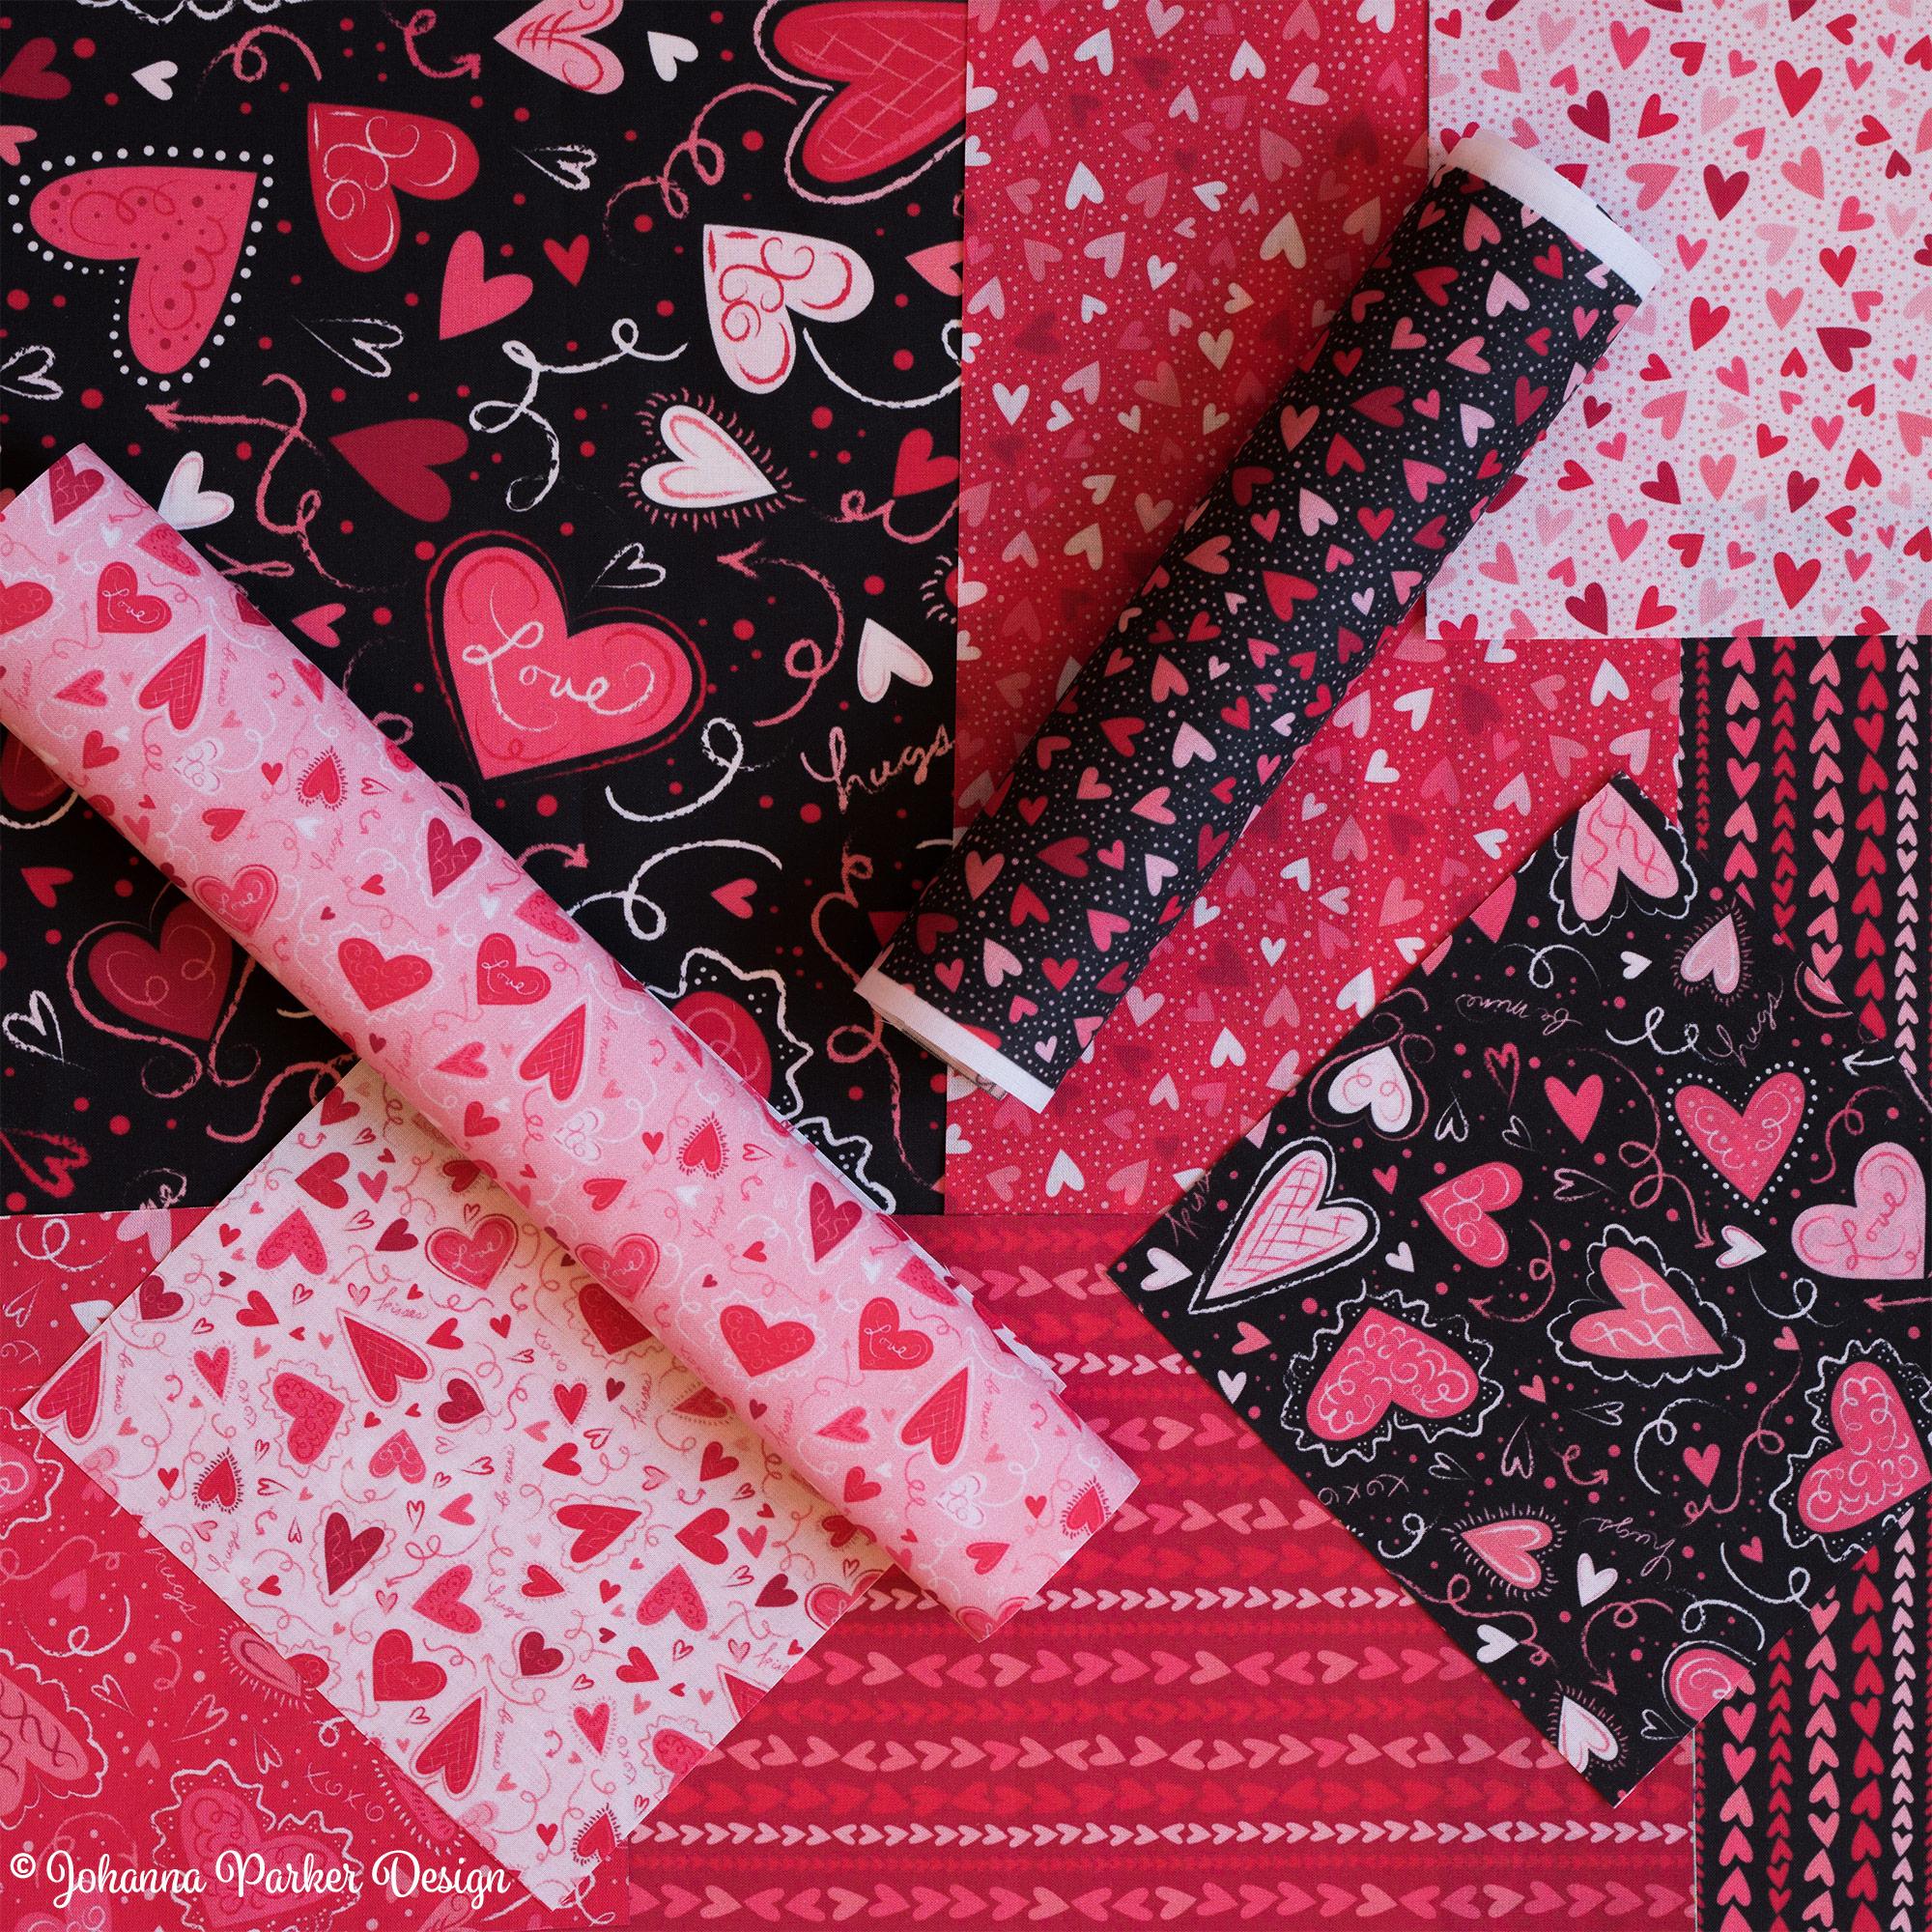 Valentine-Fabric-Johanna-Parker-Spoonflower-square.jpg